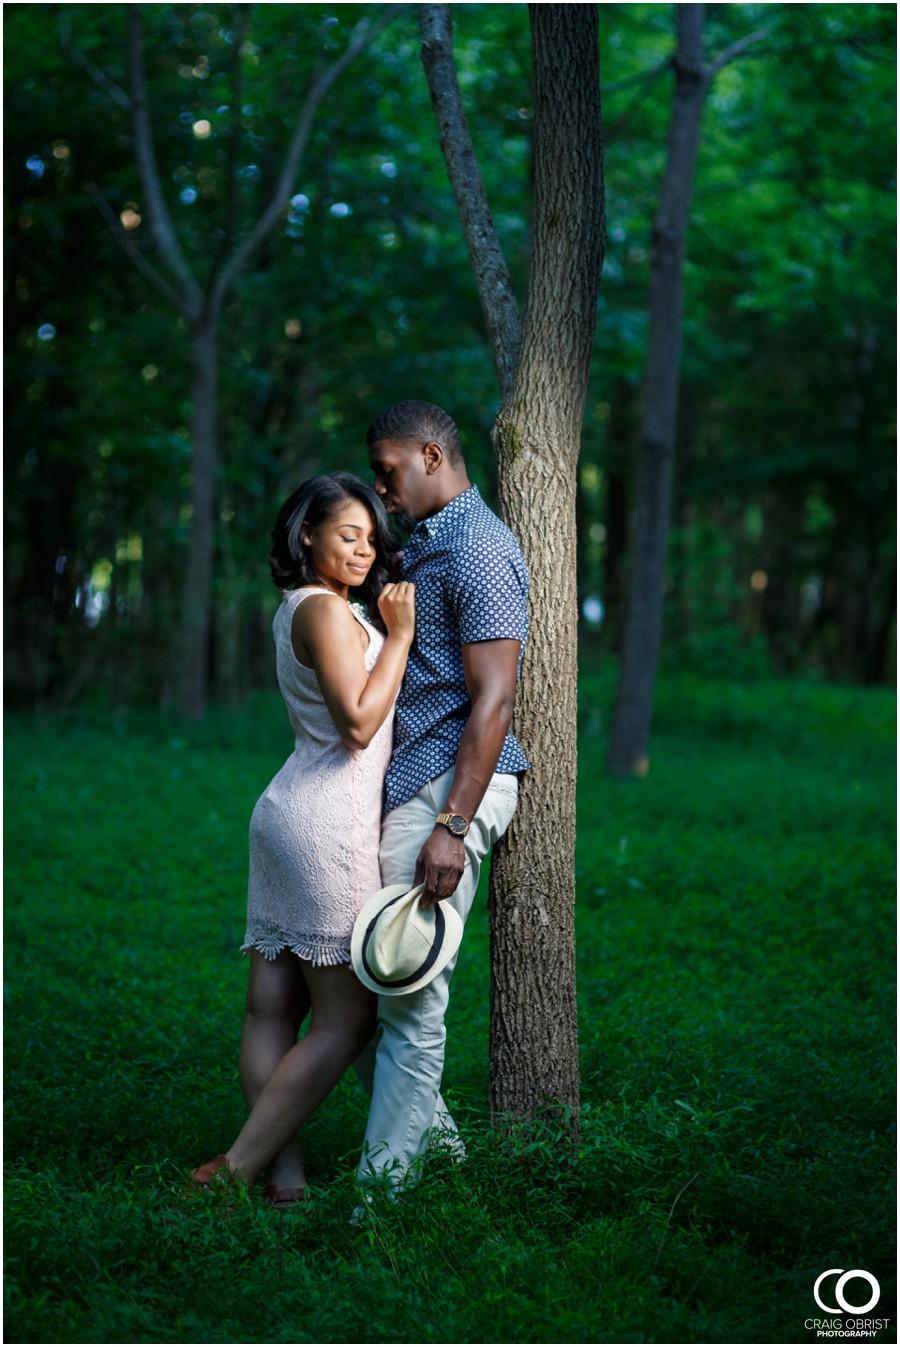 McDaniel-Farm-Park-Engagement-Portraits-Buckhead_0015.jpg